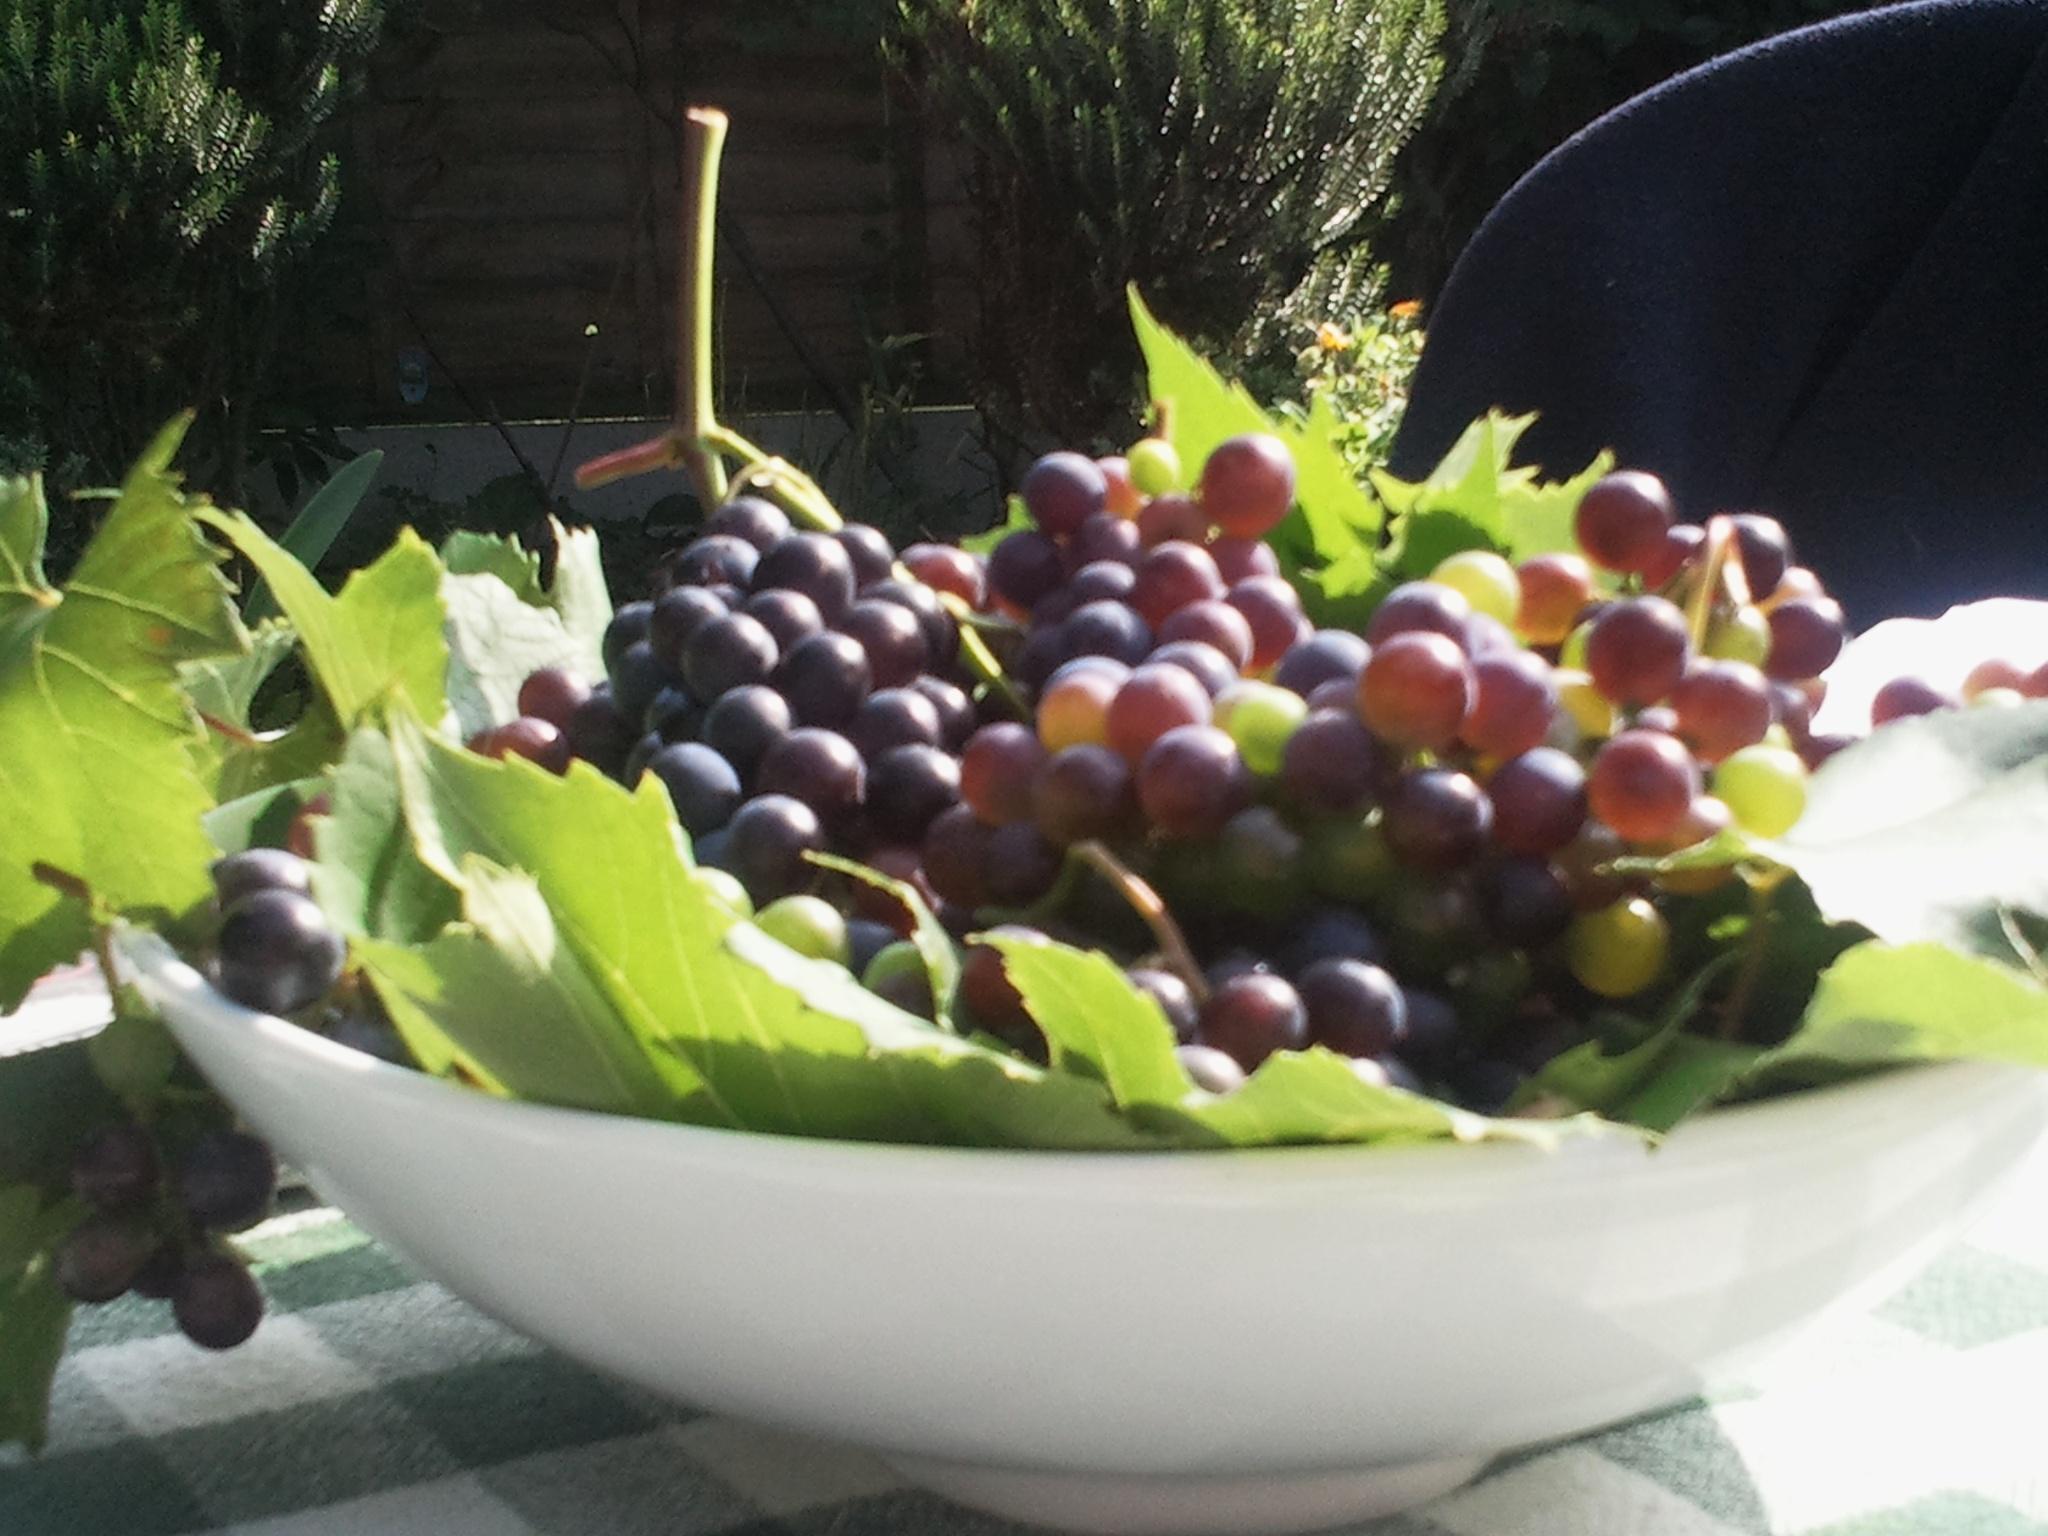 Harvesting by Reyhan K-Luttman